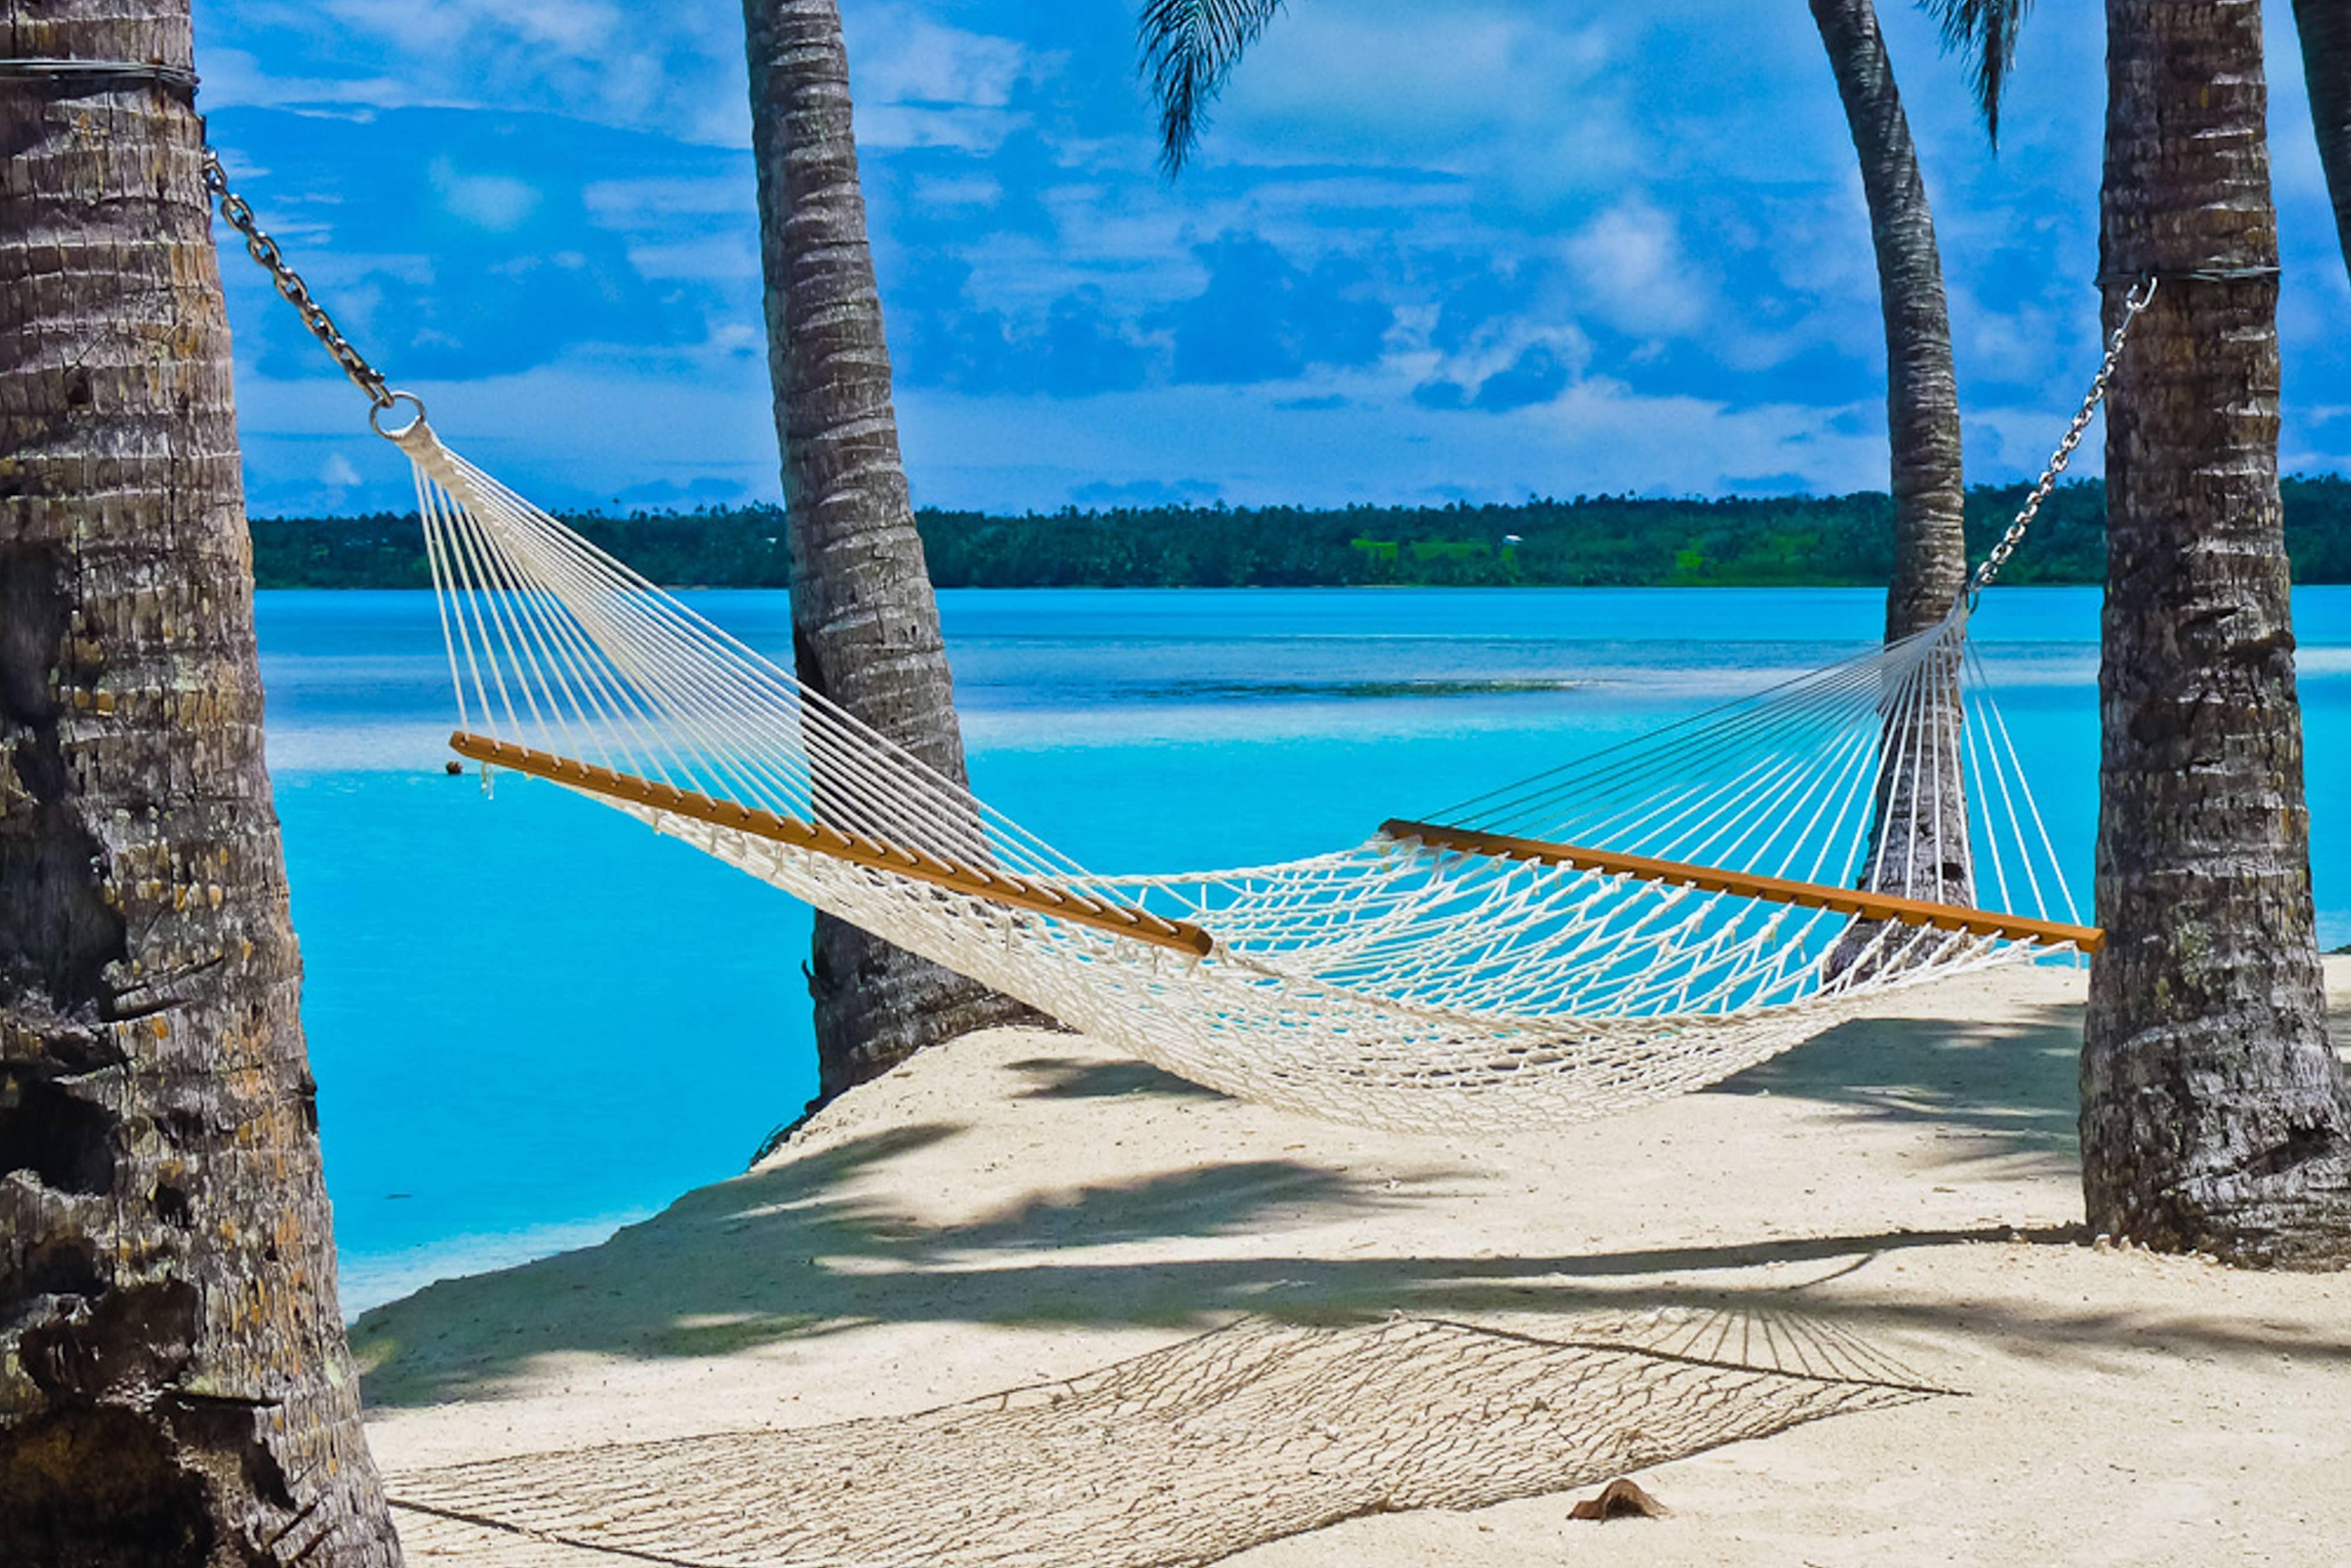 HD Hammock on Beach in the South Pacific Wallpaper | Fiji